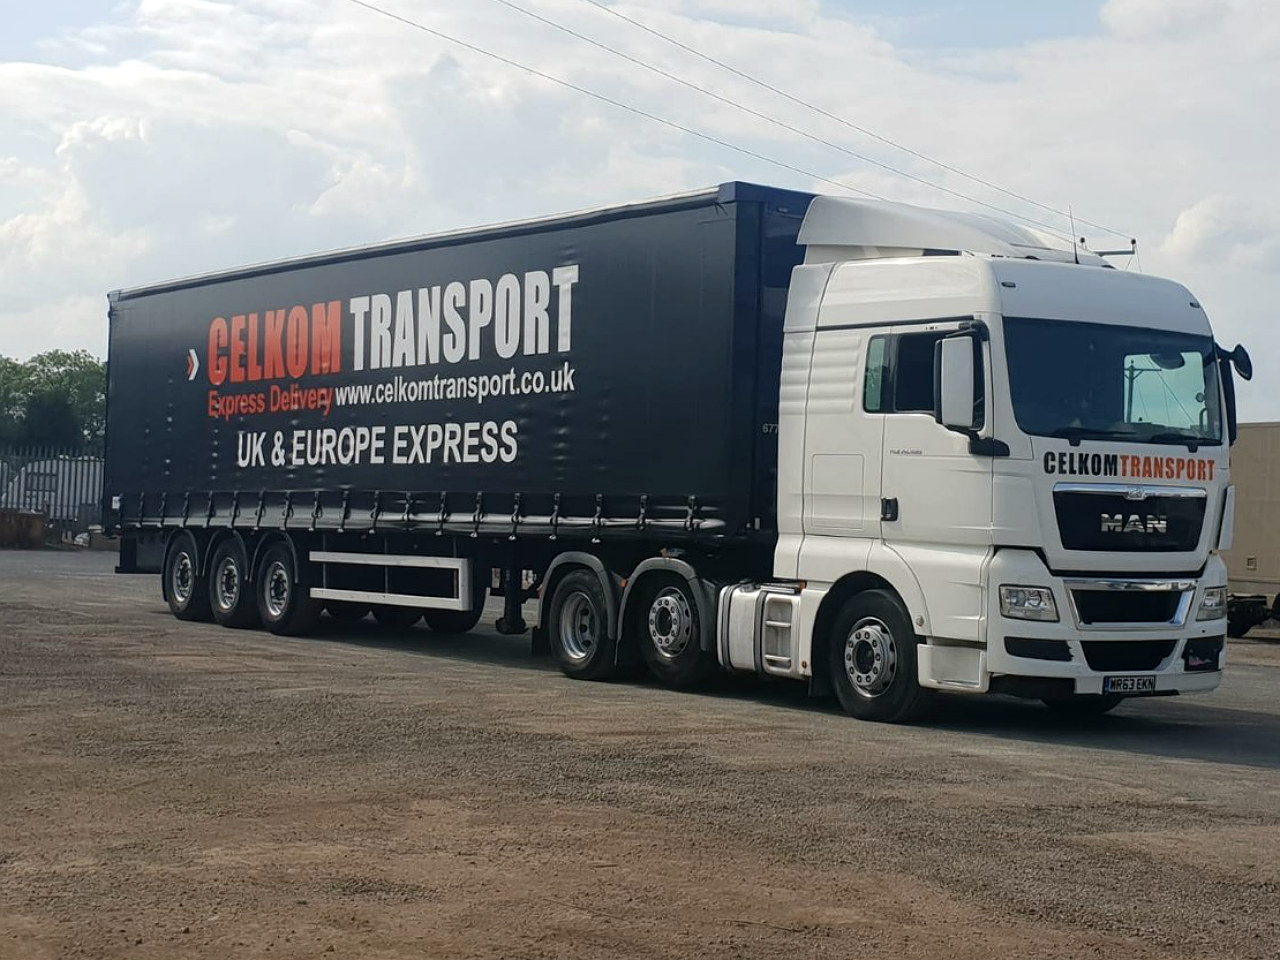 Celkom Transport